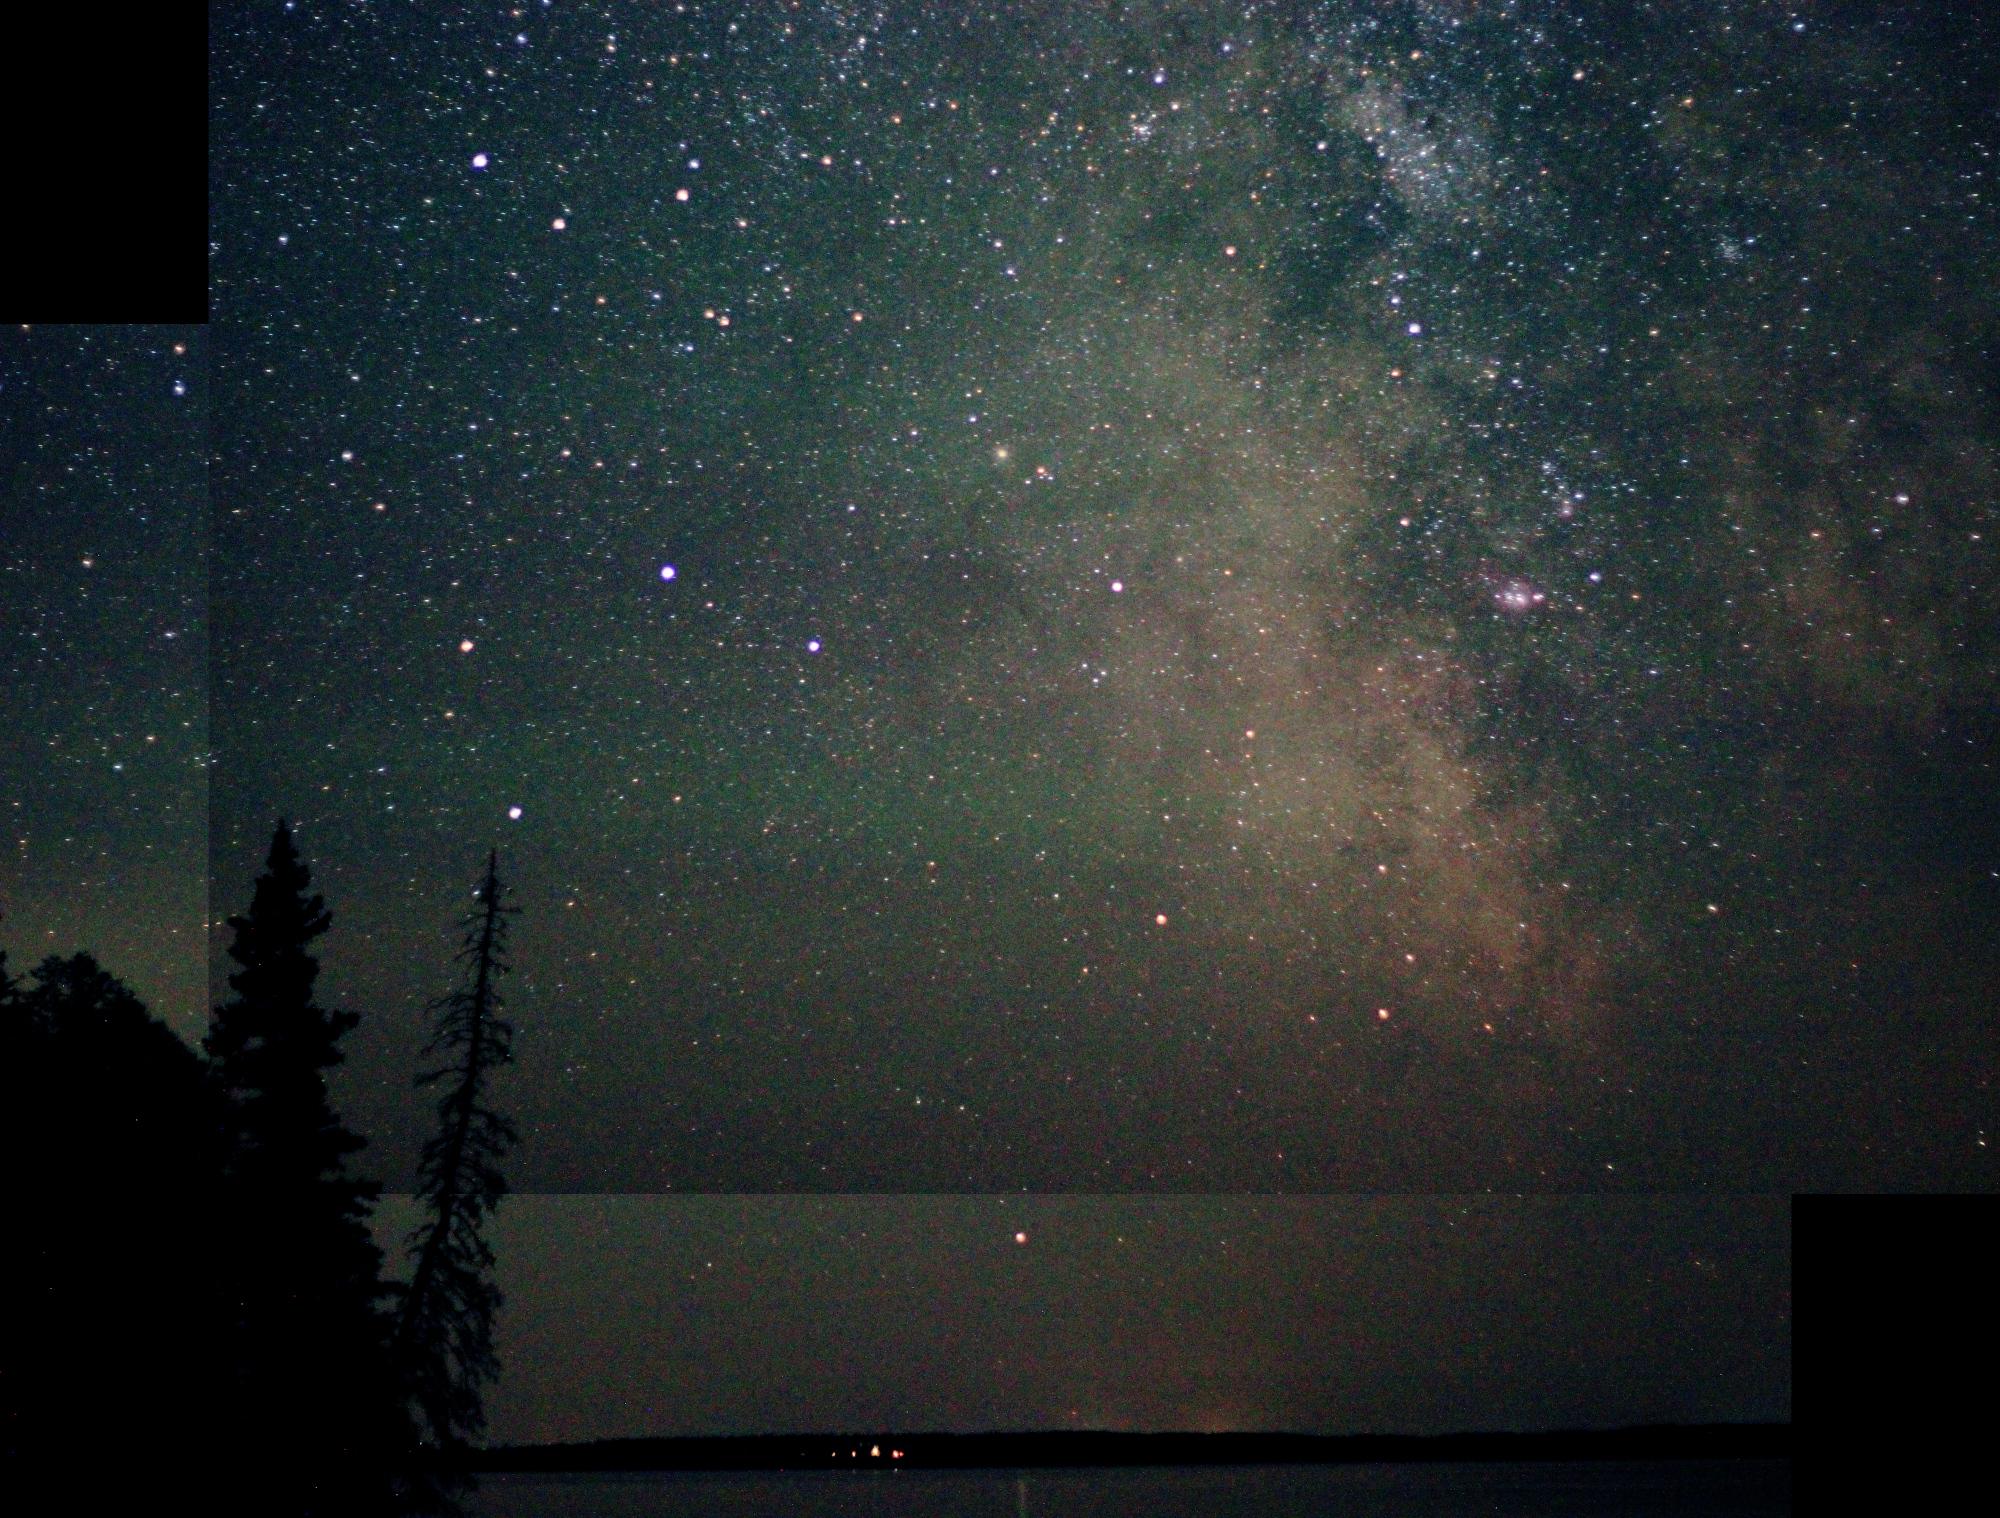 2-shot composite of the Milky Way